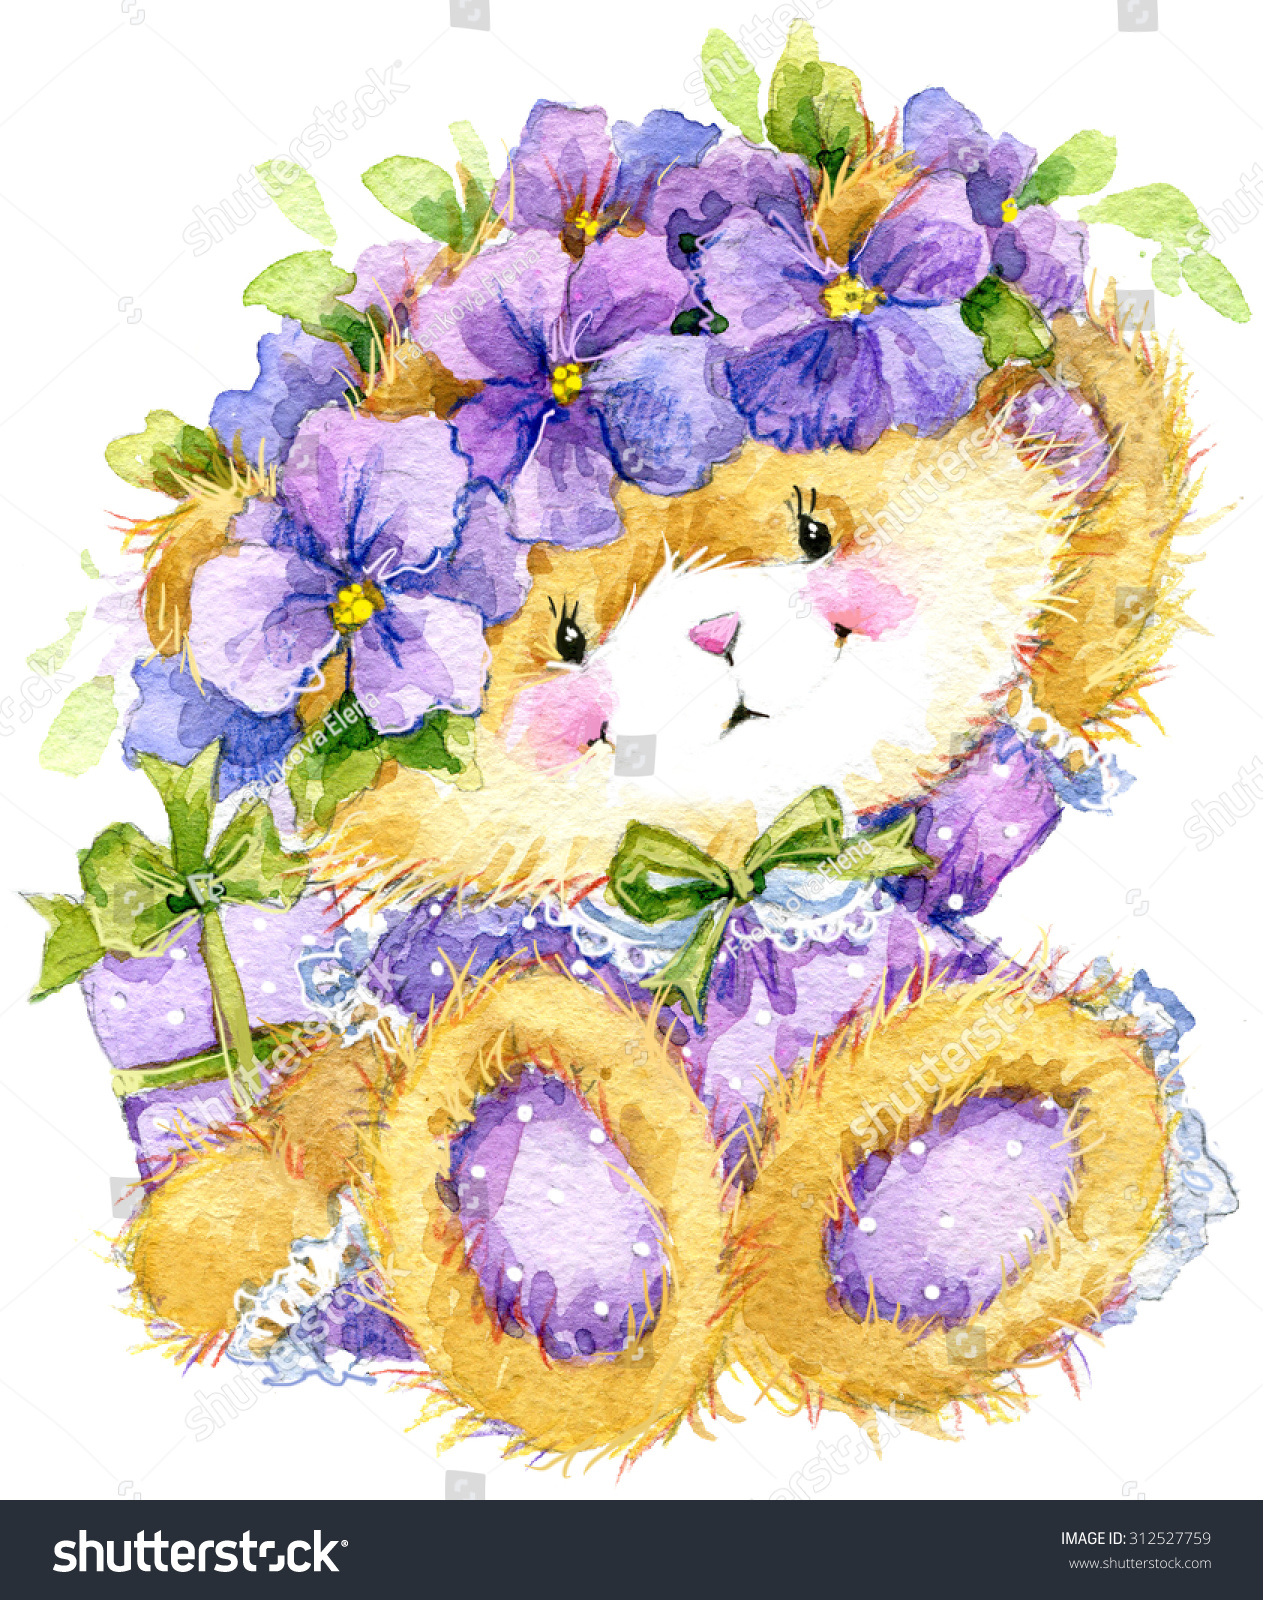 Toy Teddy Bear Flower Violet Toy Stock Illustration 312527759